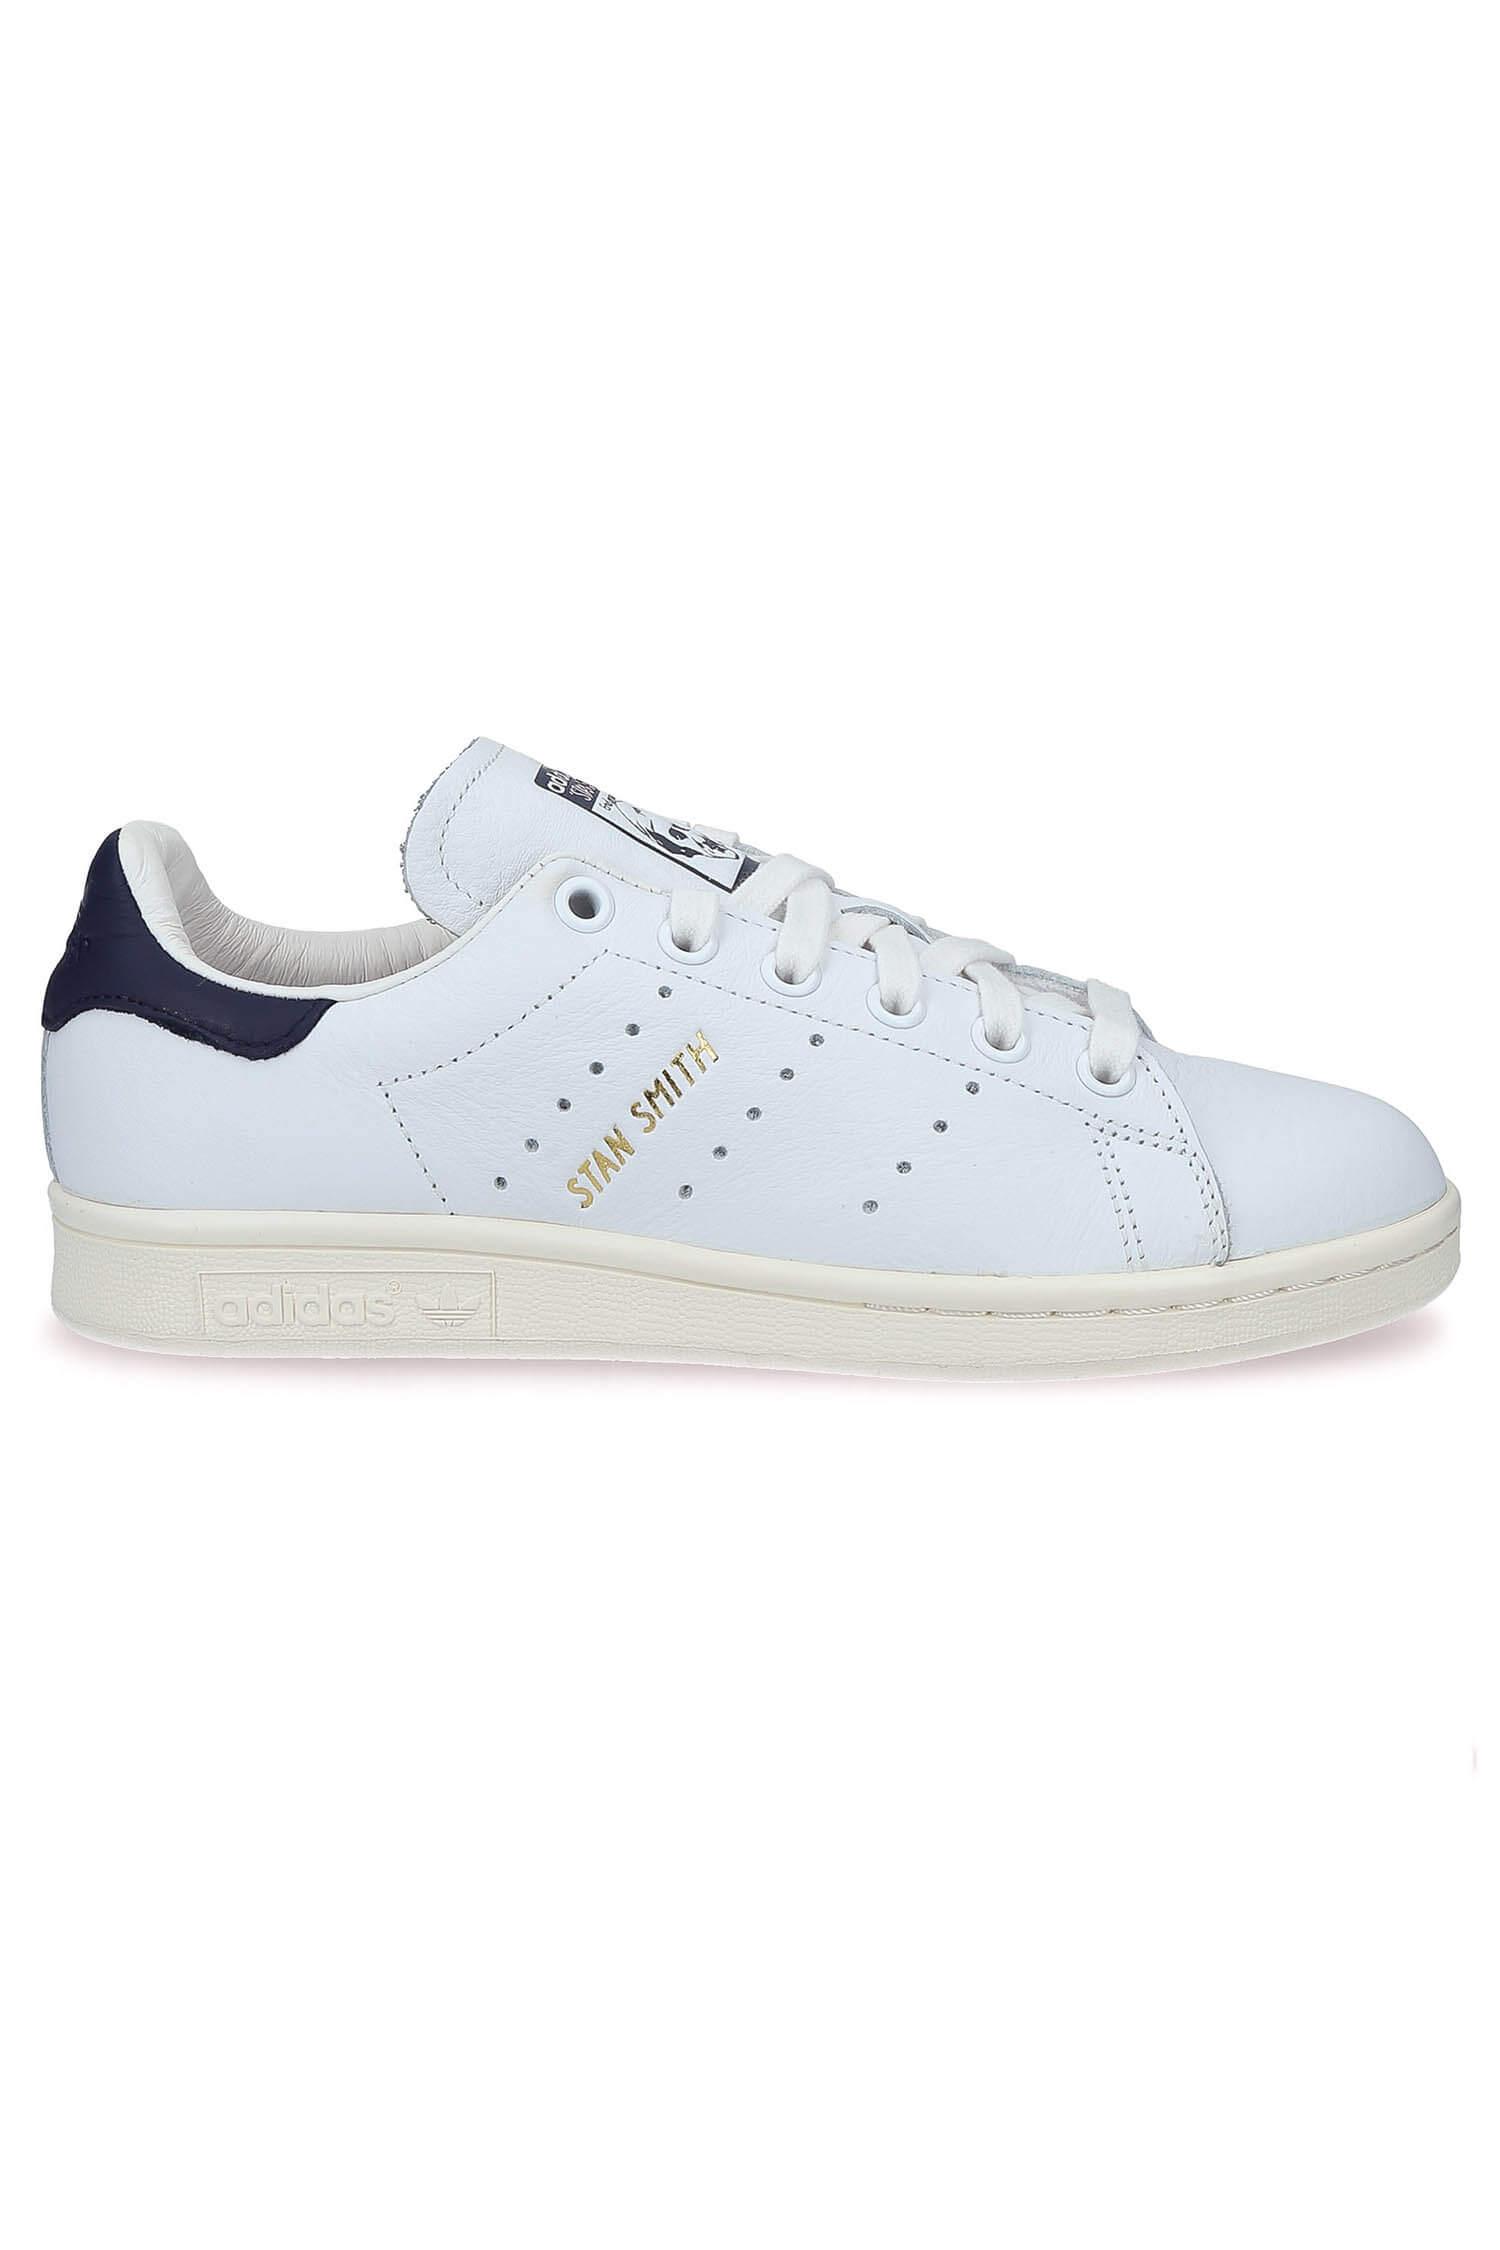 chaussures de séparation be858 36701 Baskets Stan Smith patch Bleu marine